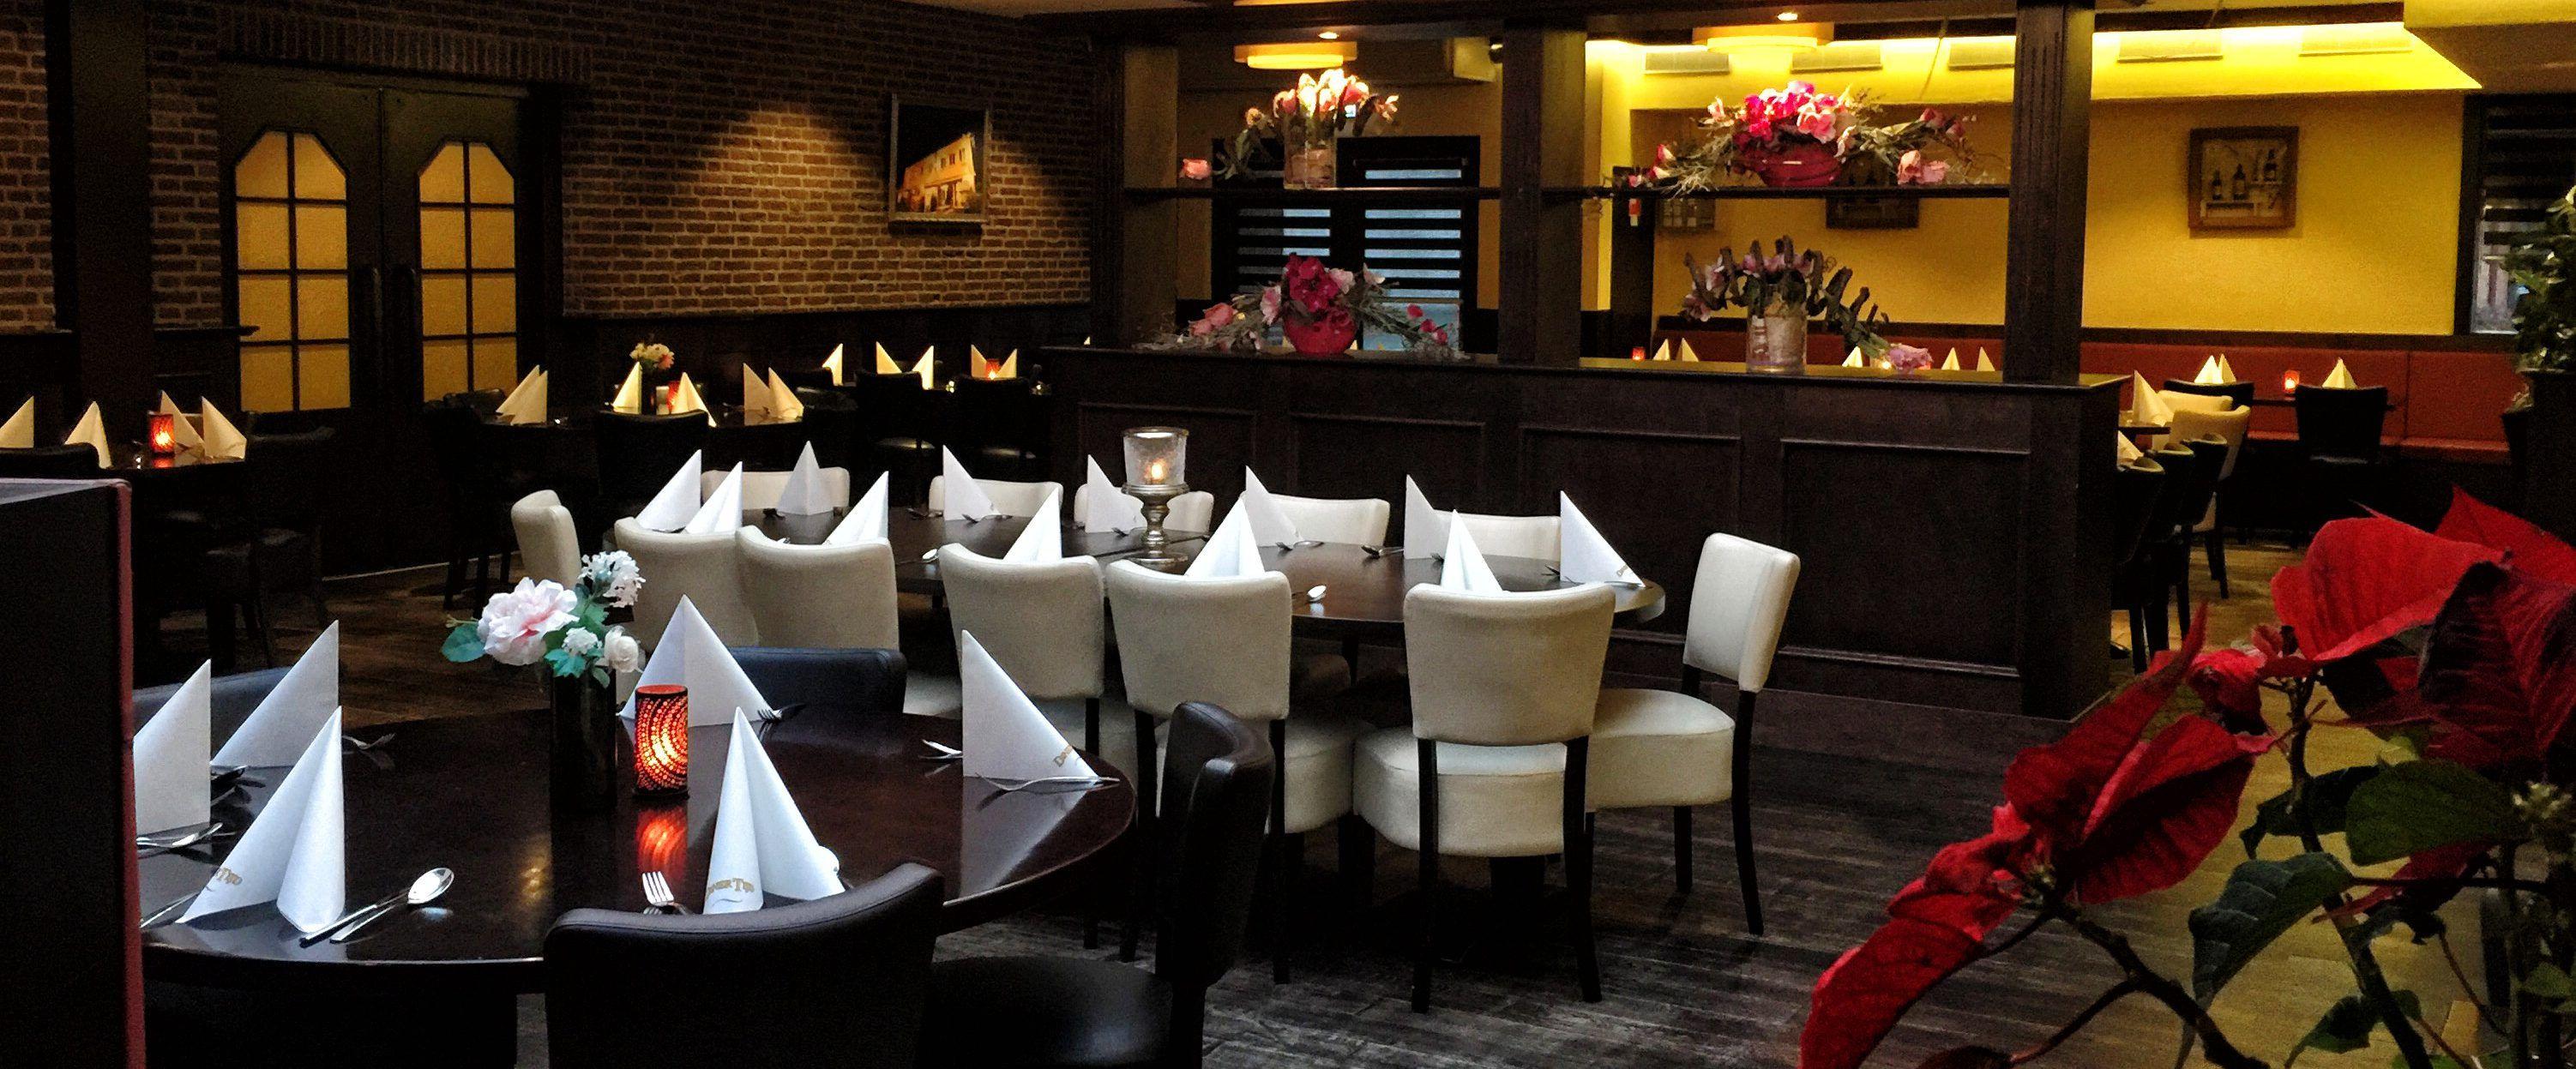 dinertijd-restaurant-2